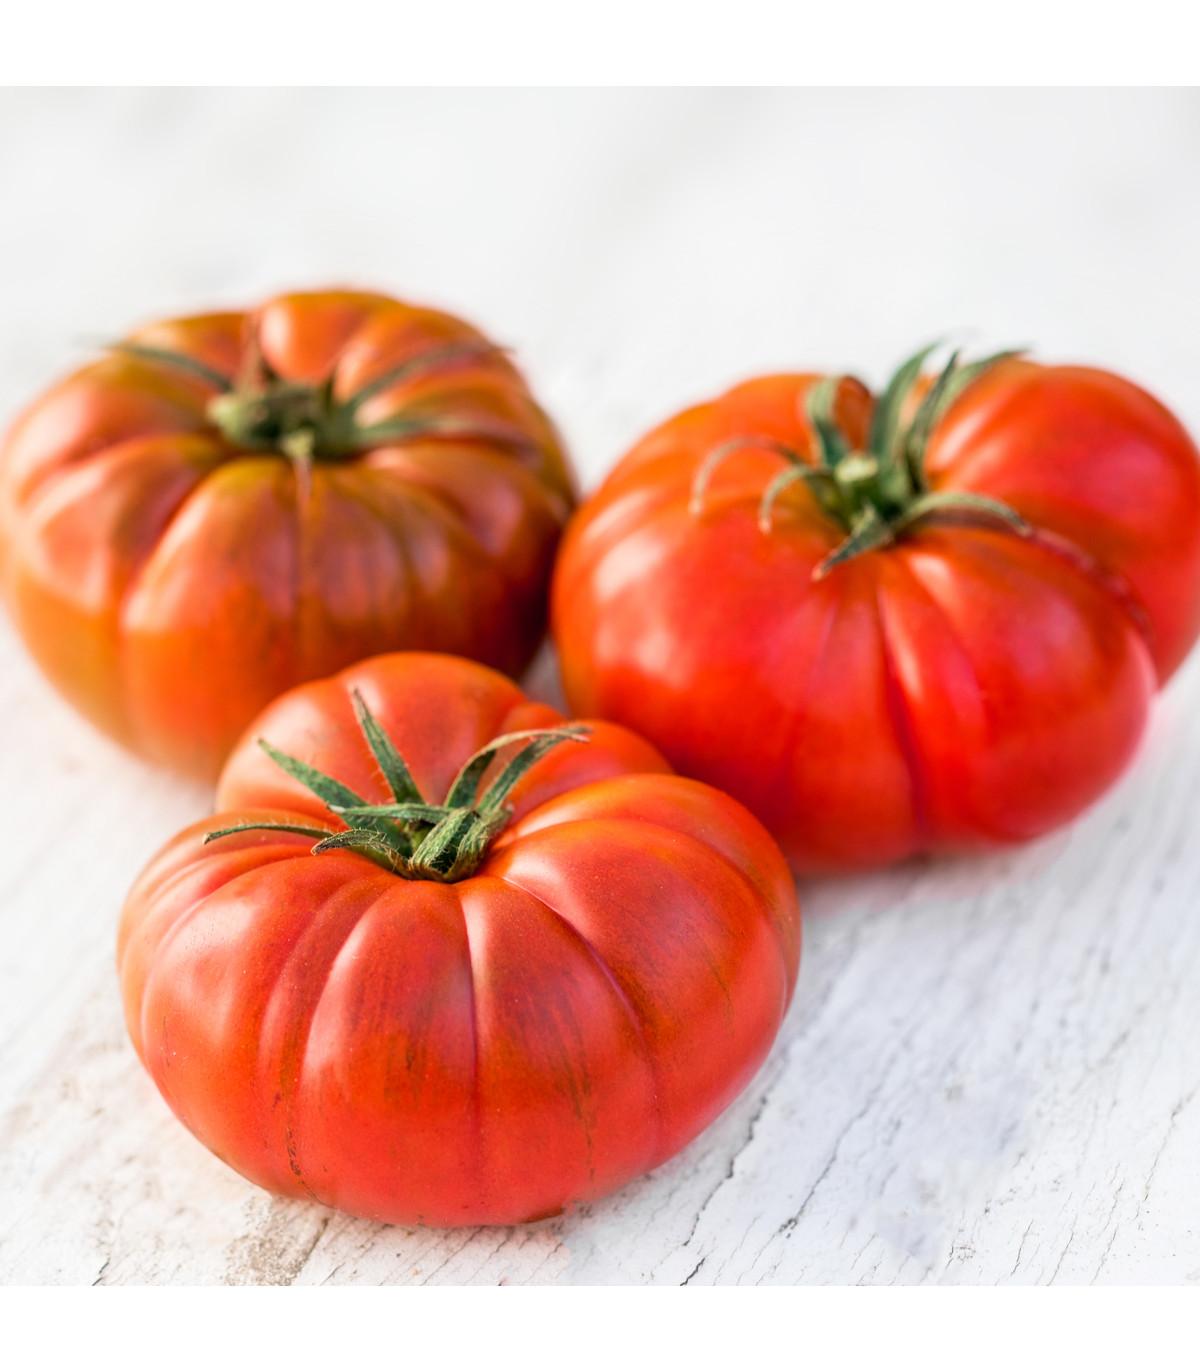 Rajče Brandywine červené - semena Rajčat - 7 ks